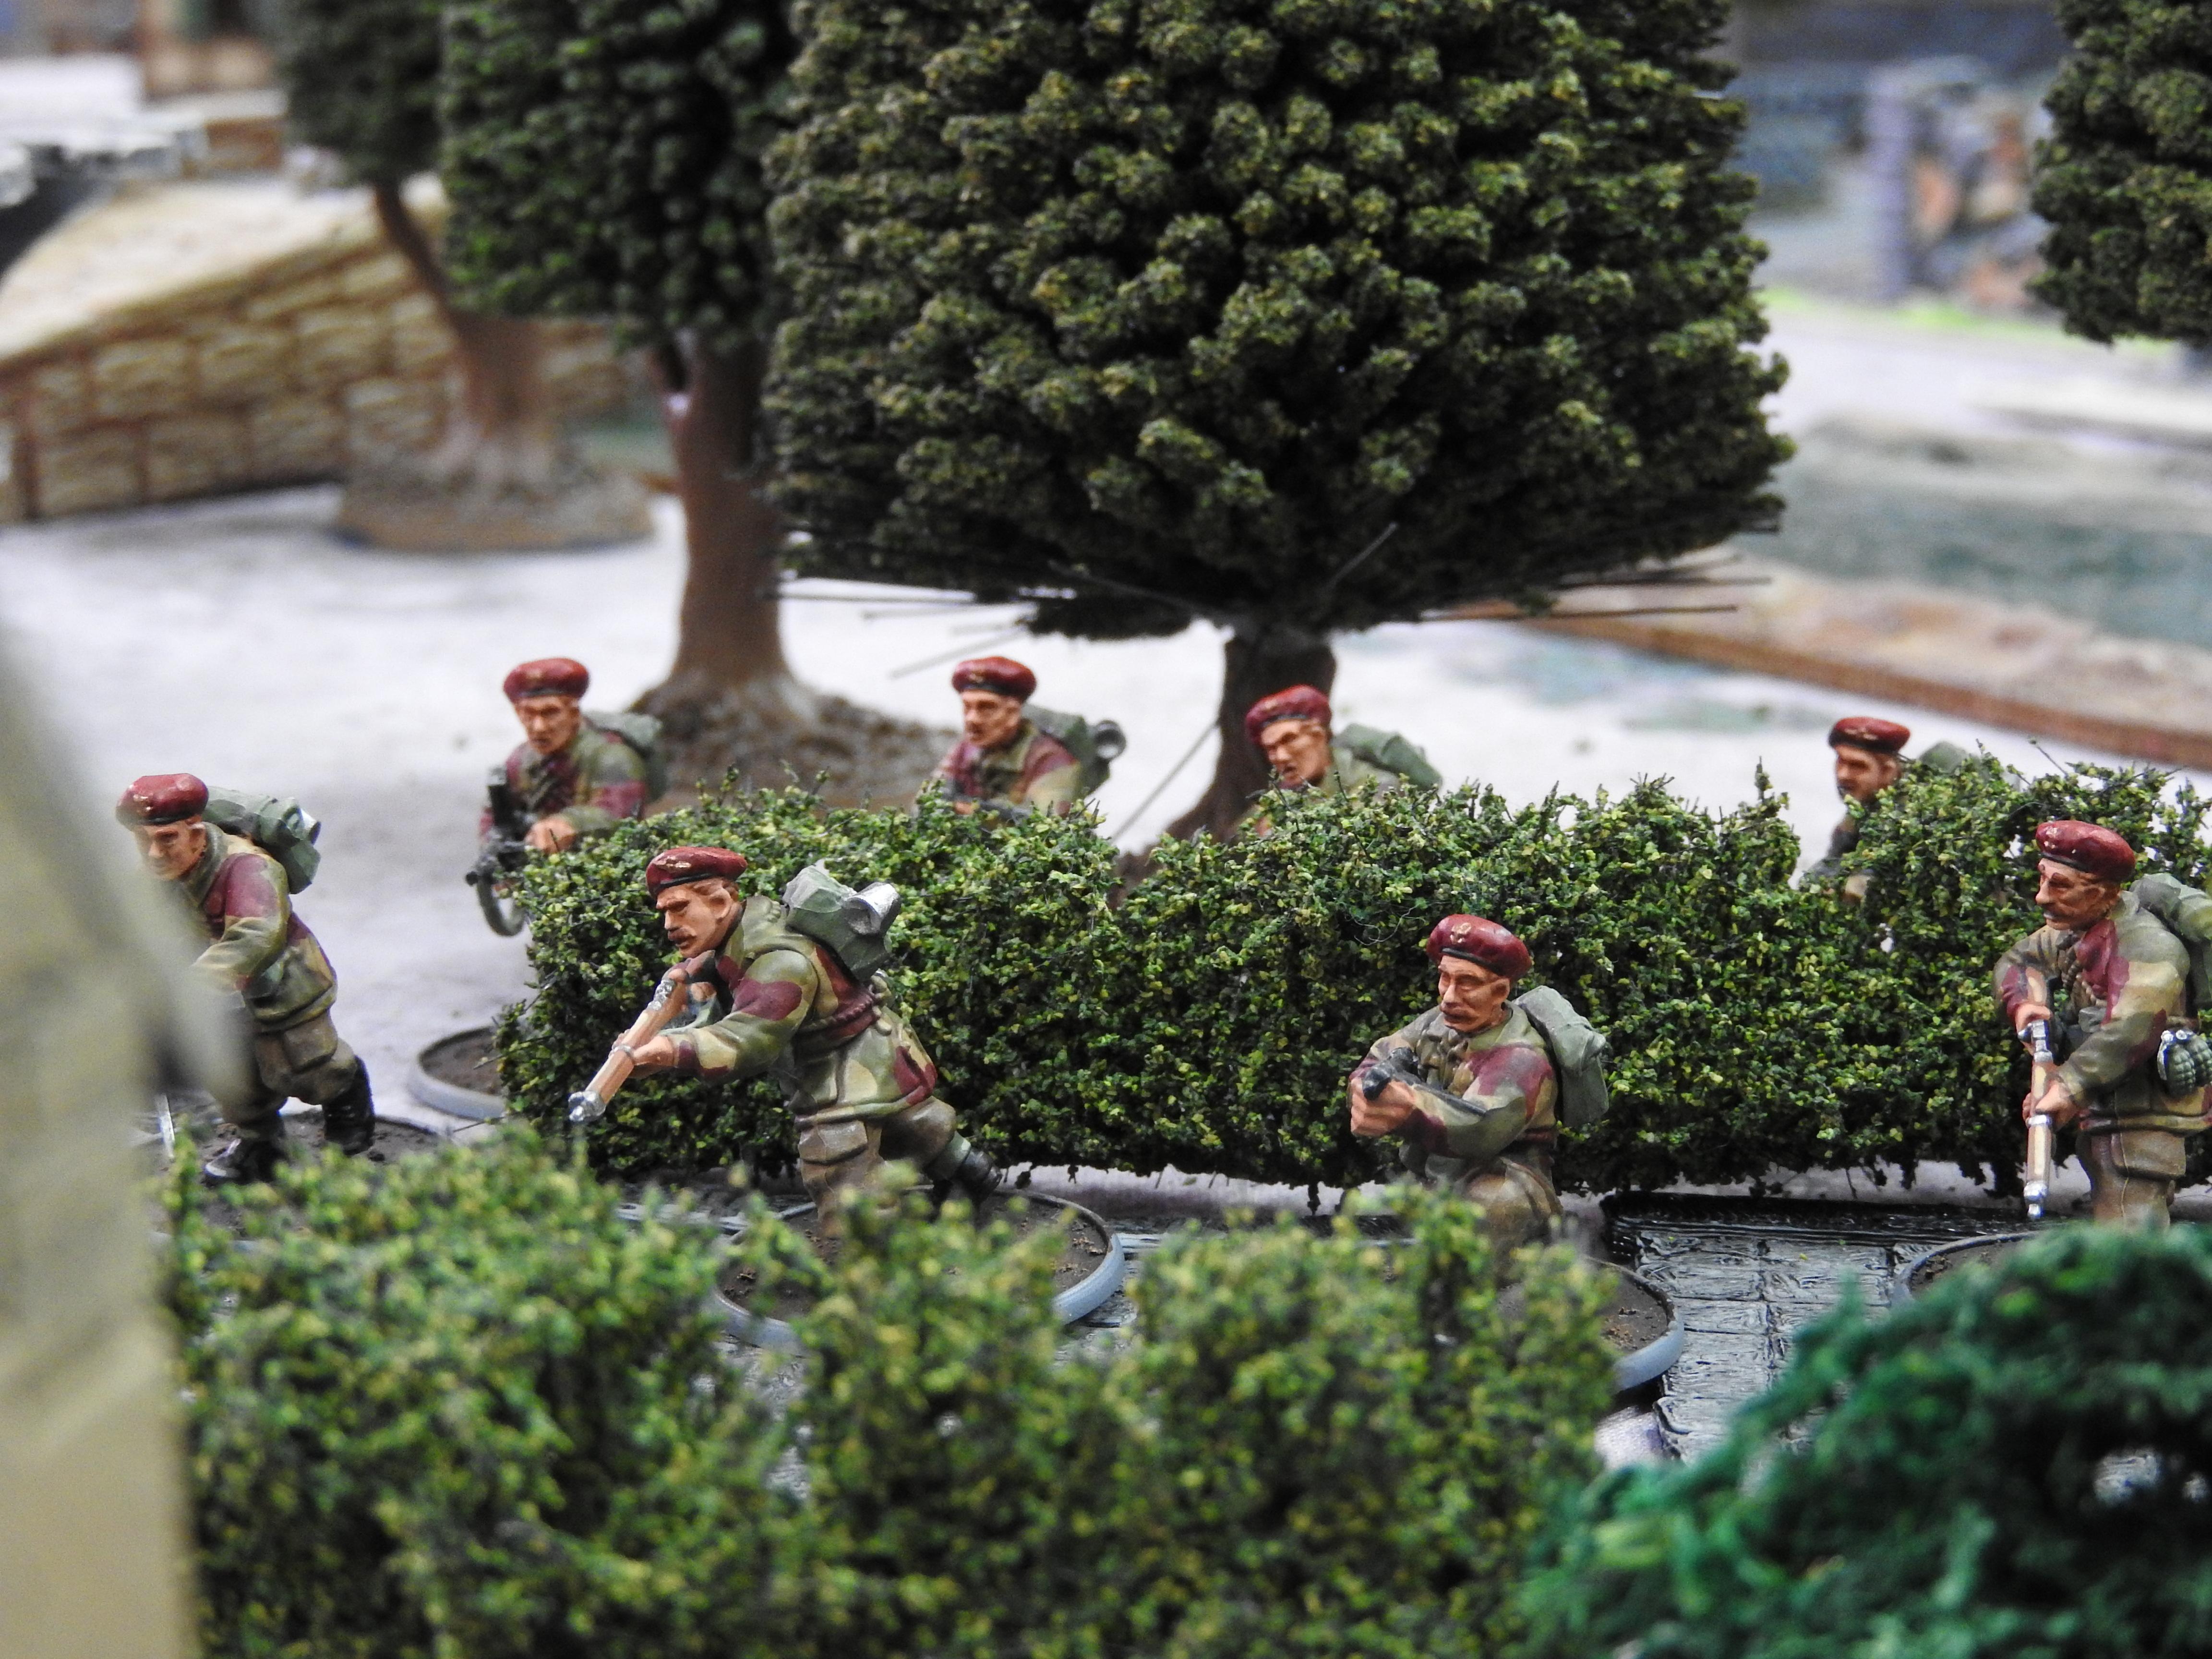 Red Devils versus Italien in a fierce infantry engagement